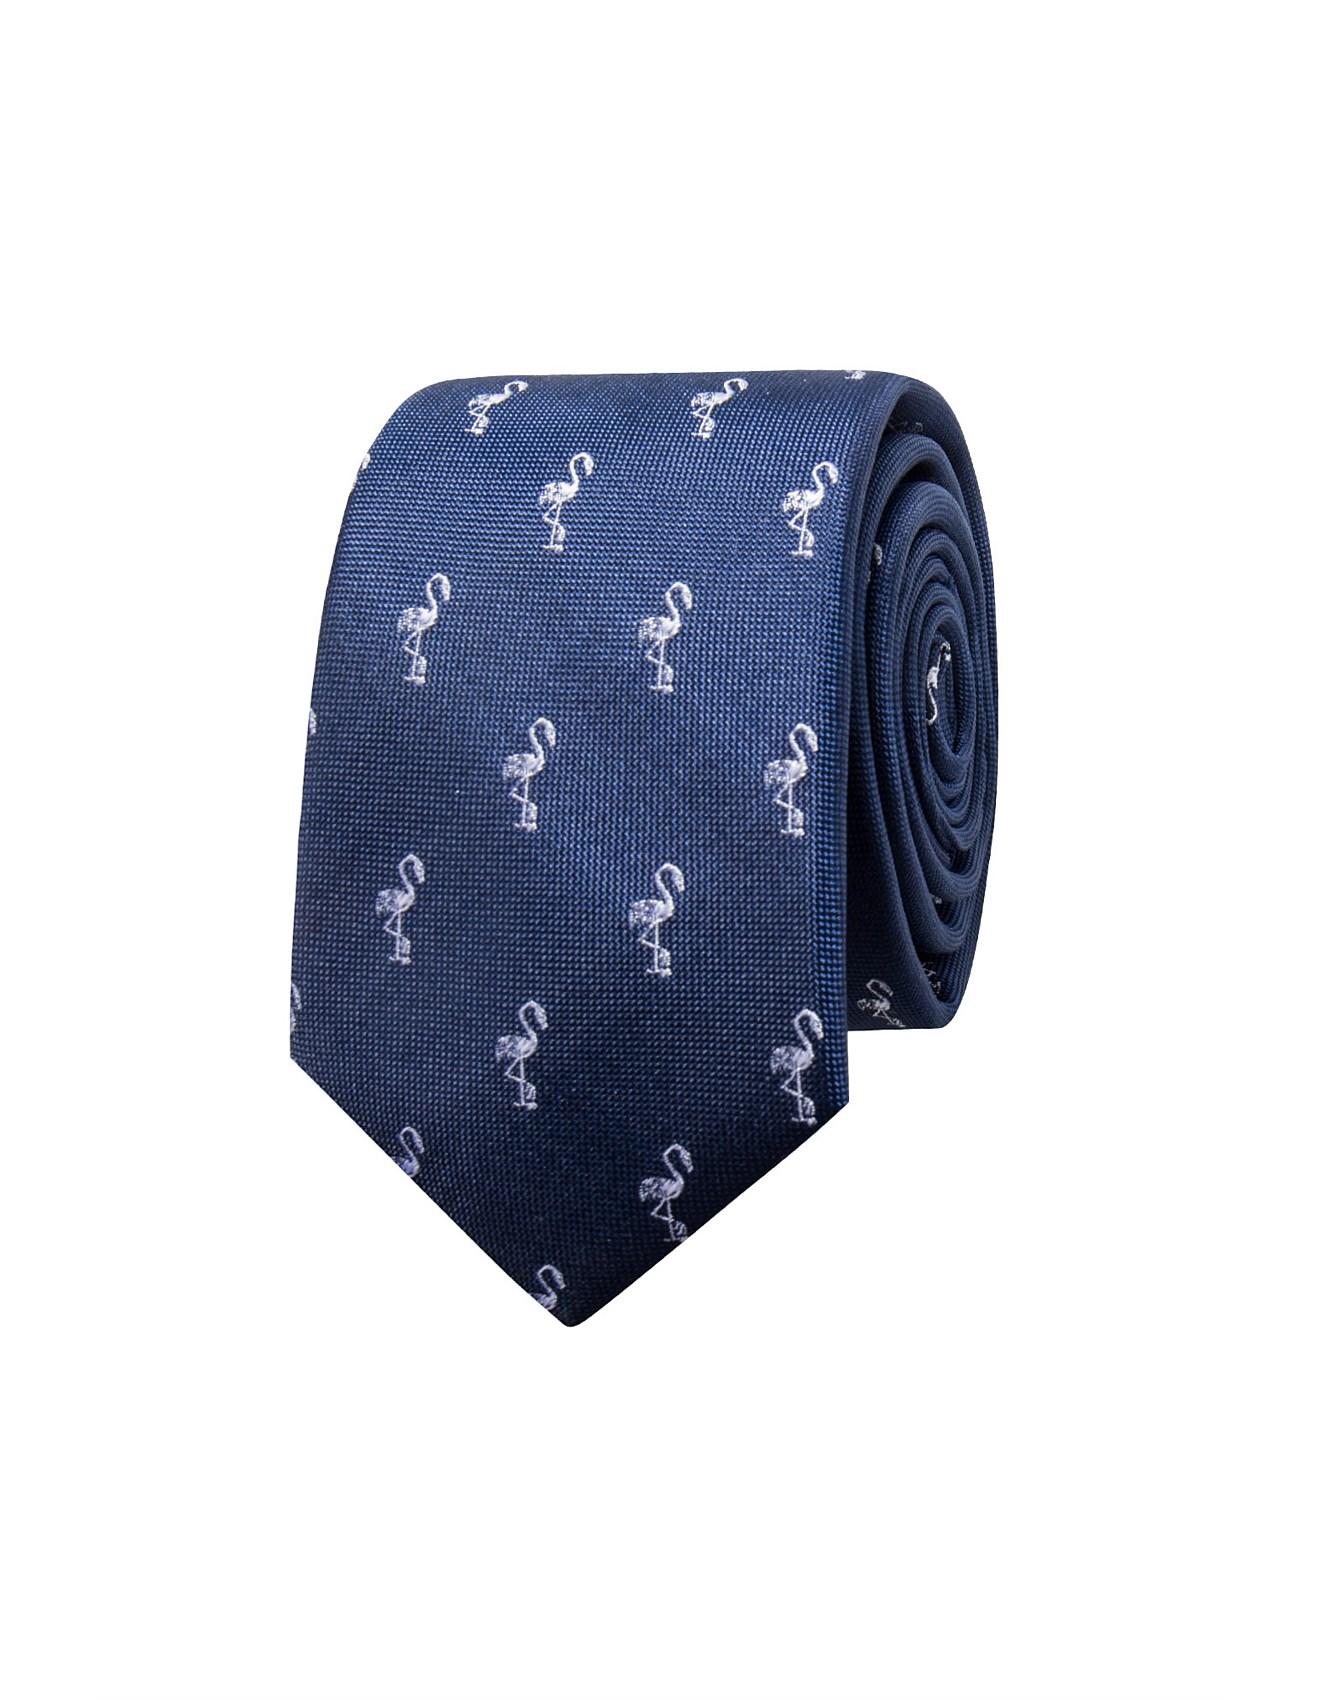 ff2365fe17ae4 Ties & Pocket Squares Sale | Men's Suiting Accessories | David Jones -  FLAMINGO TIE